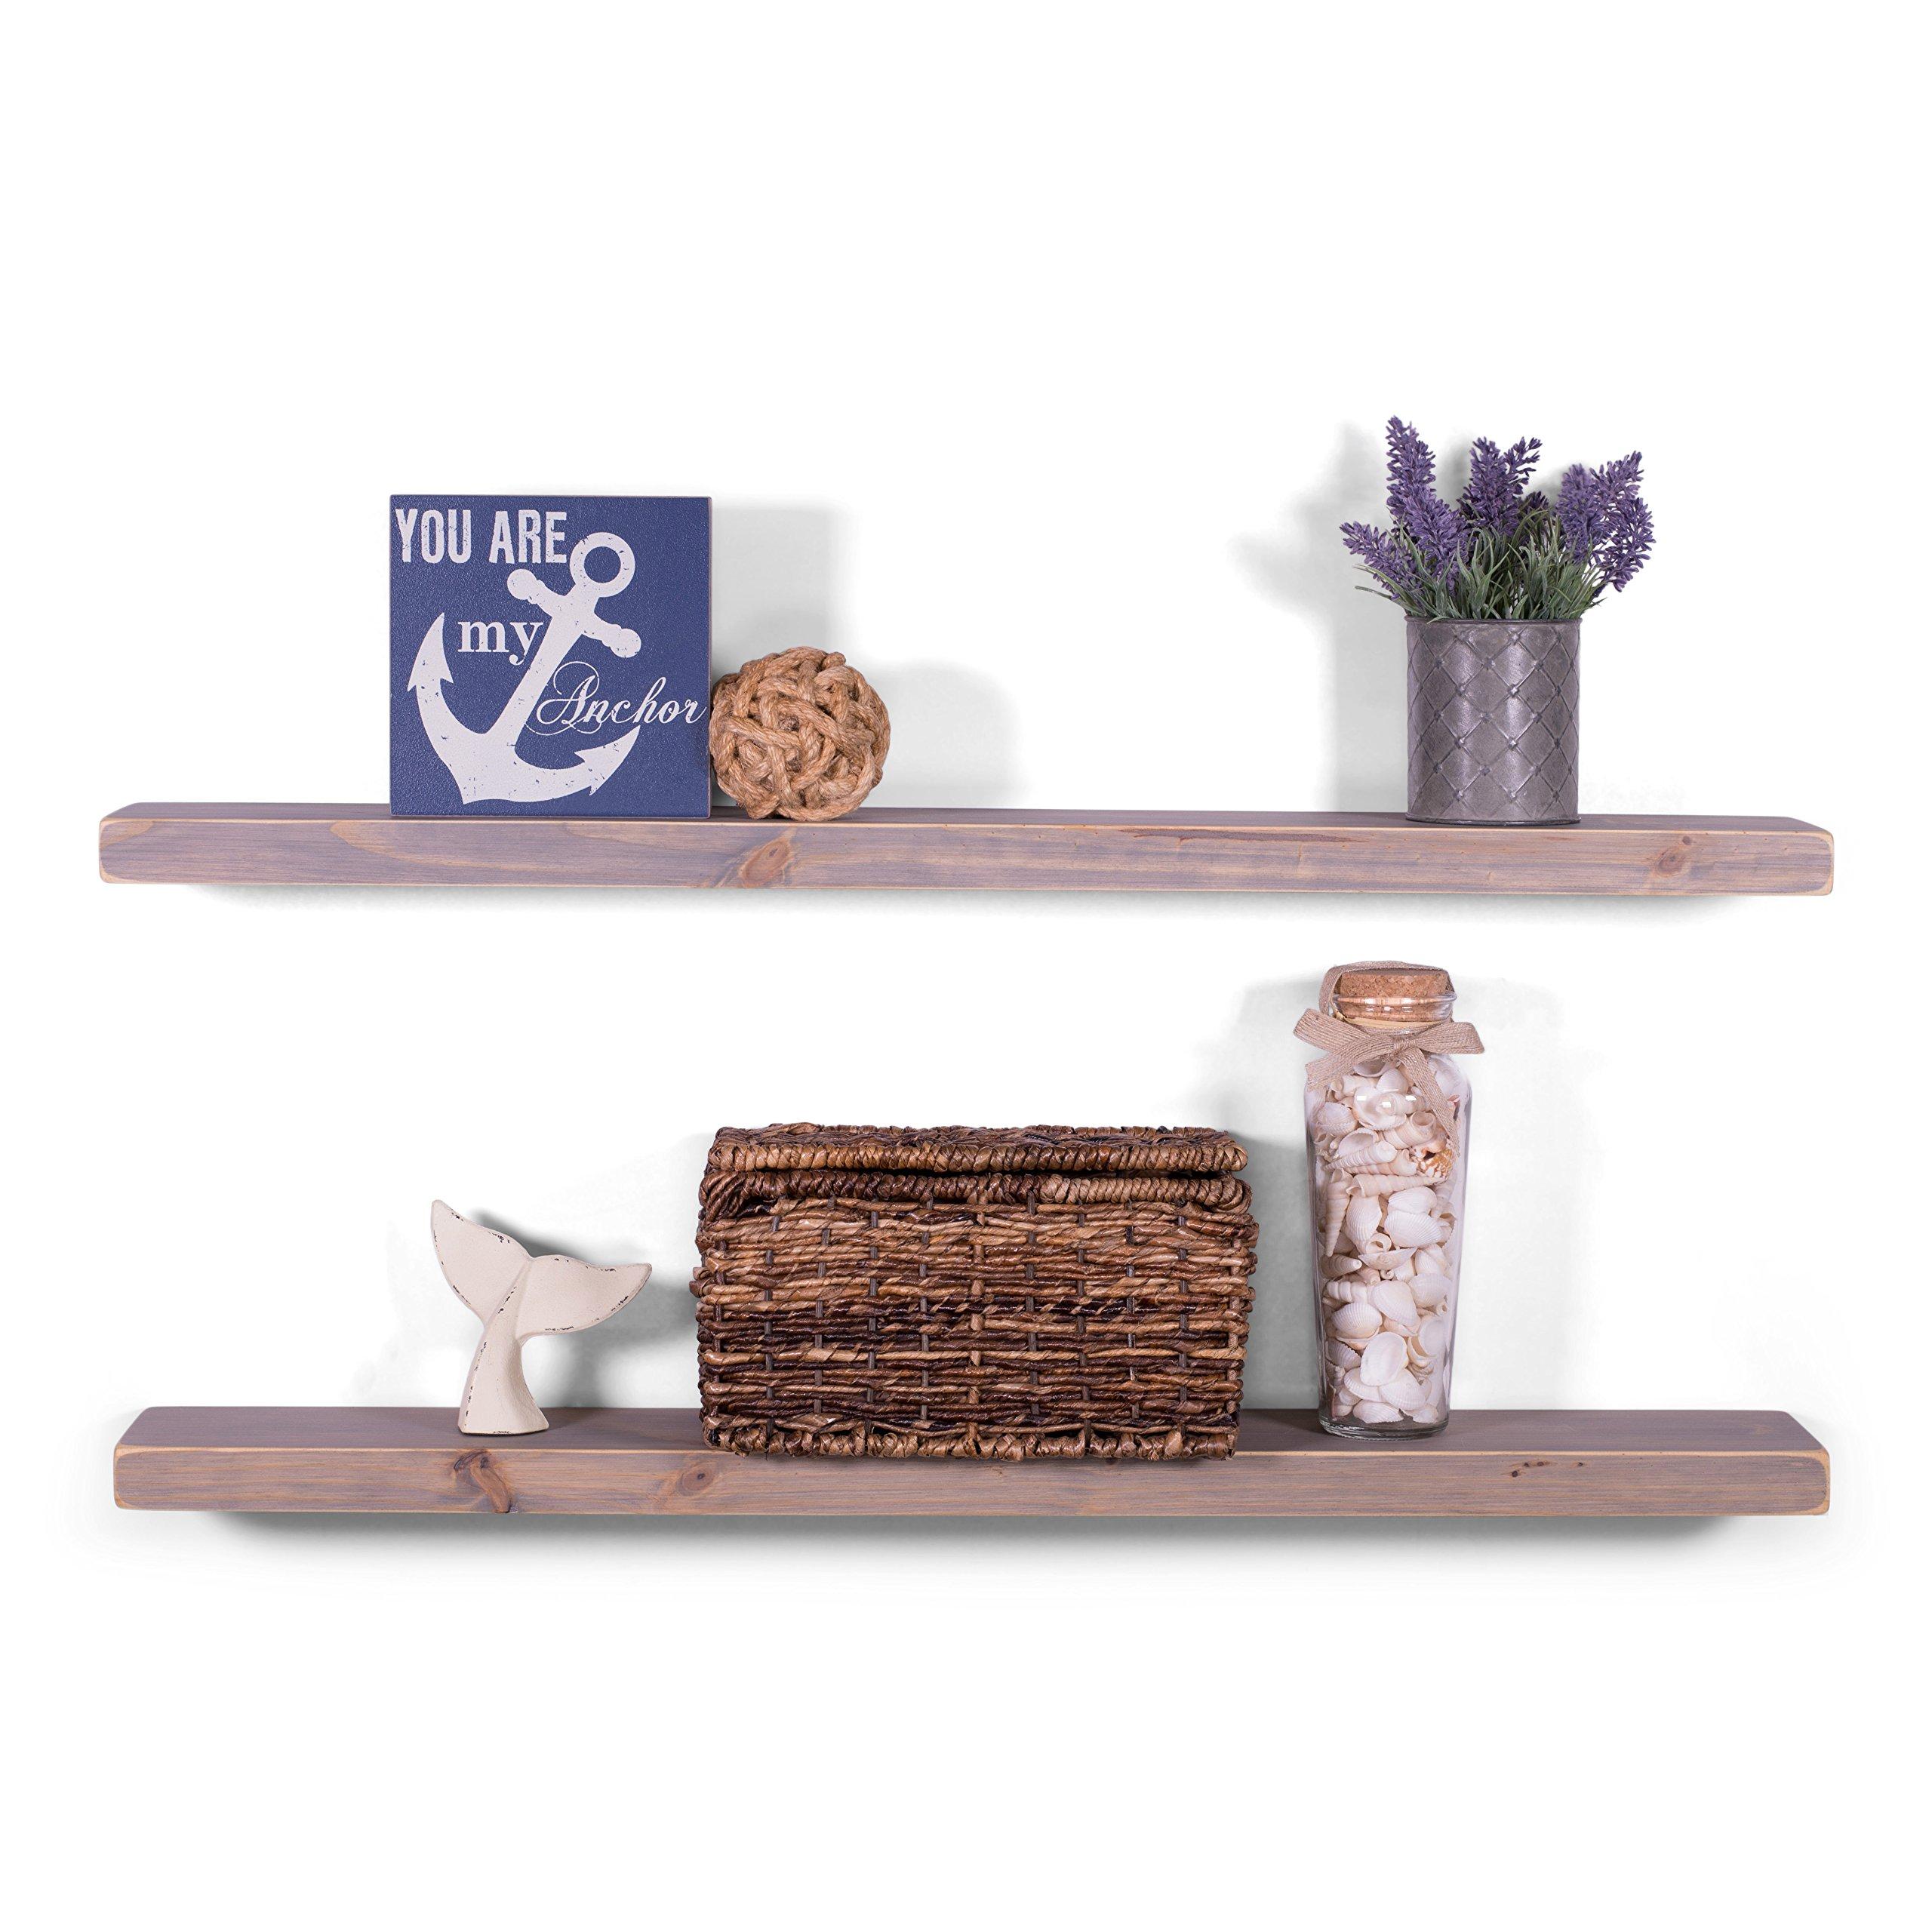 DAKODA LOVE 5.25'' Deep Weathered Edge Floating Shelves, USA Handmade, Clear Coat Finish, 100% Countersunk Hidden Floating Shelf Brackets, Beautiful Grain Pine Wood Rustic (Set of 2) (36'', Greige)